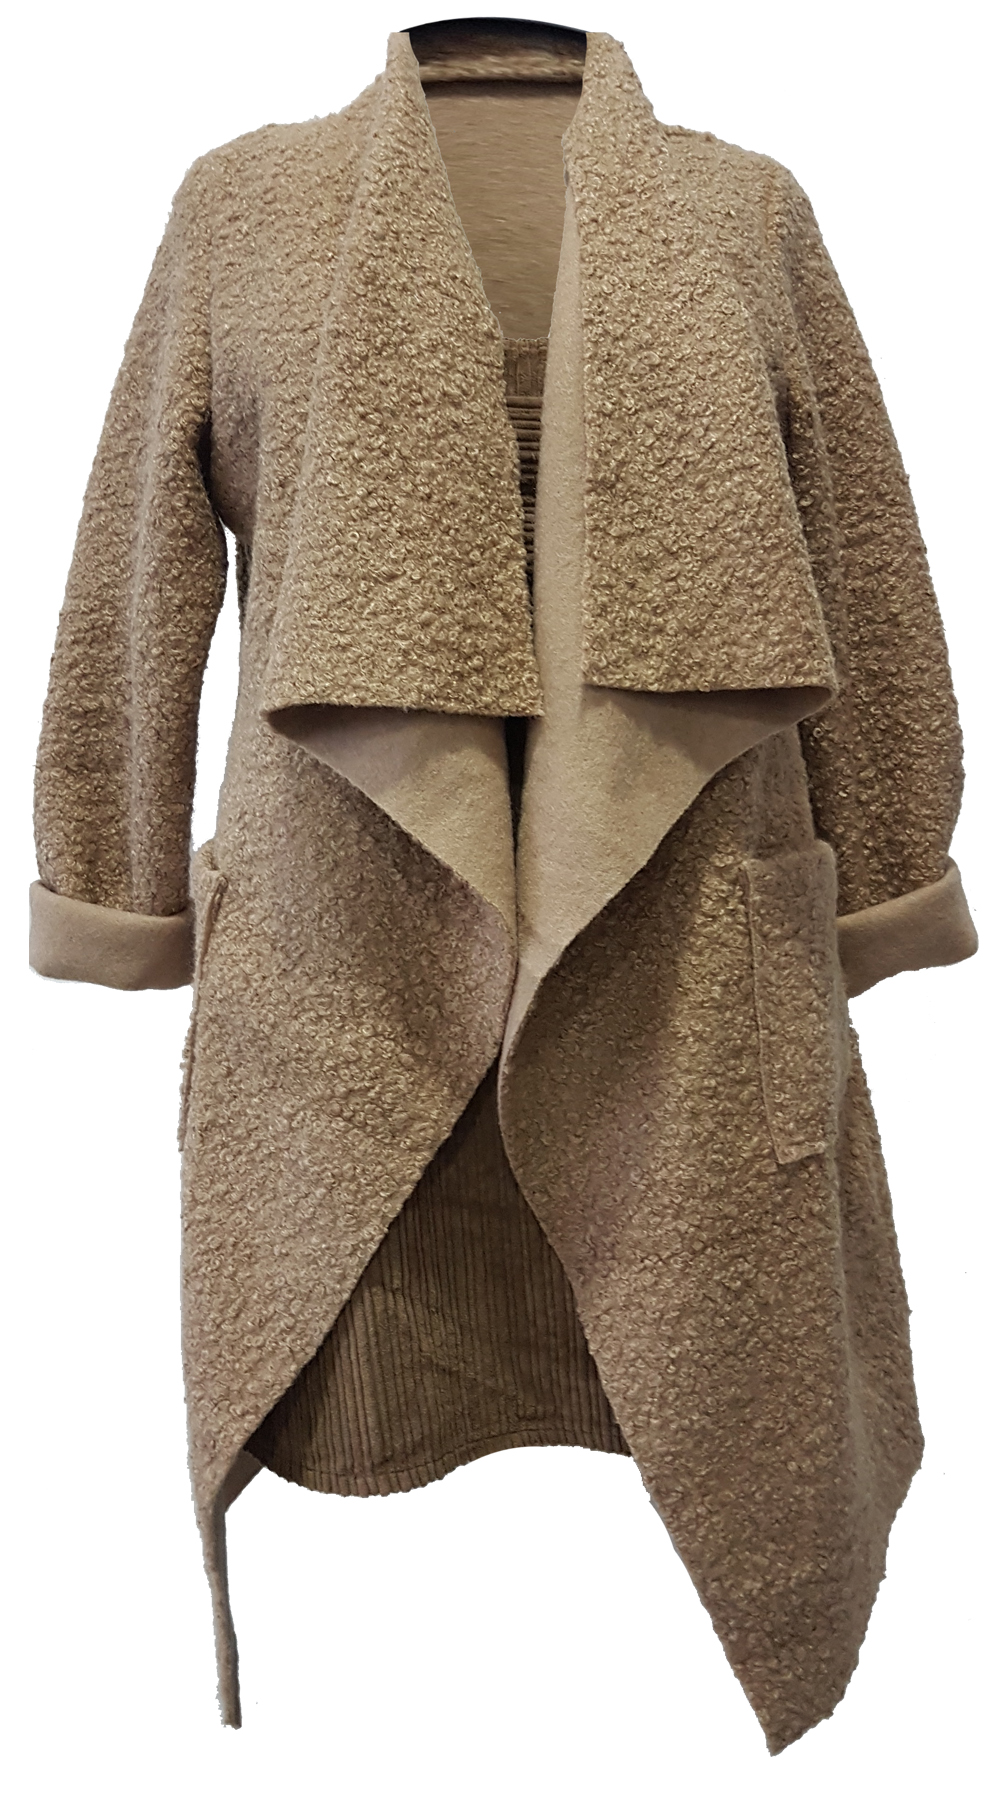 MISSREINA - Κορυφαία προϊόντα για ολοκληρωμένα Outfit - Σελίδα 3 ... 856fbe1f8c3